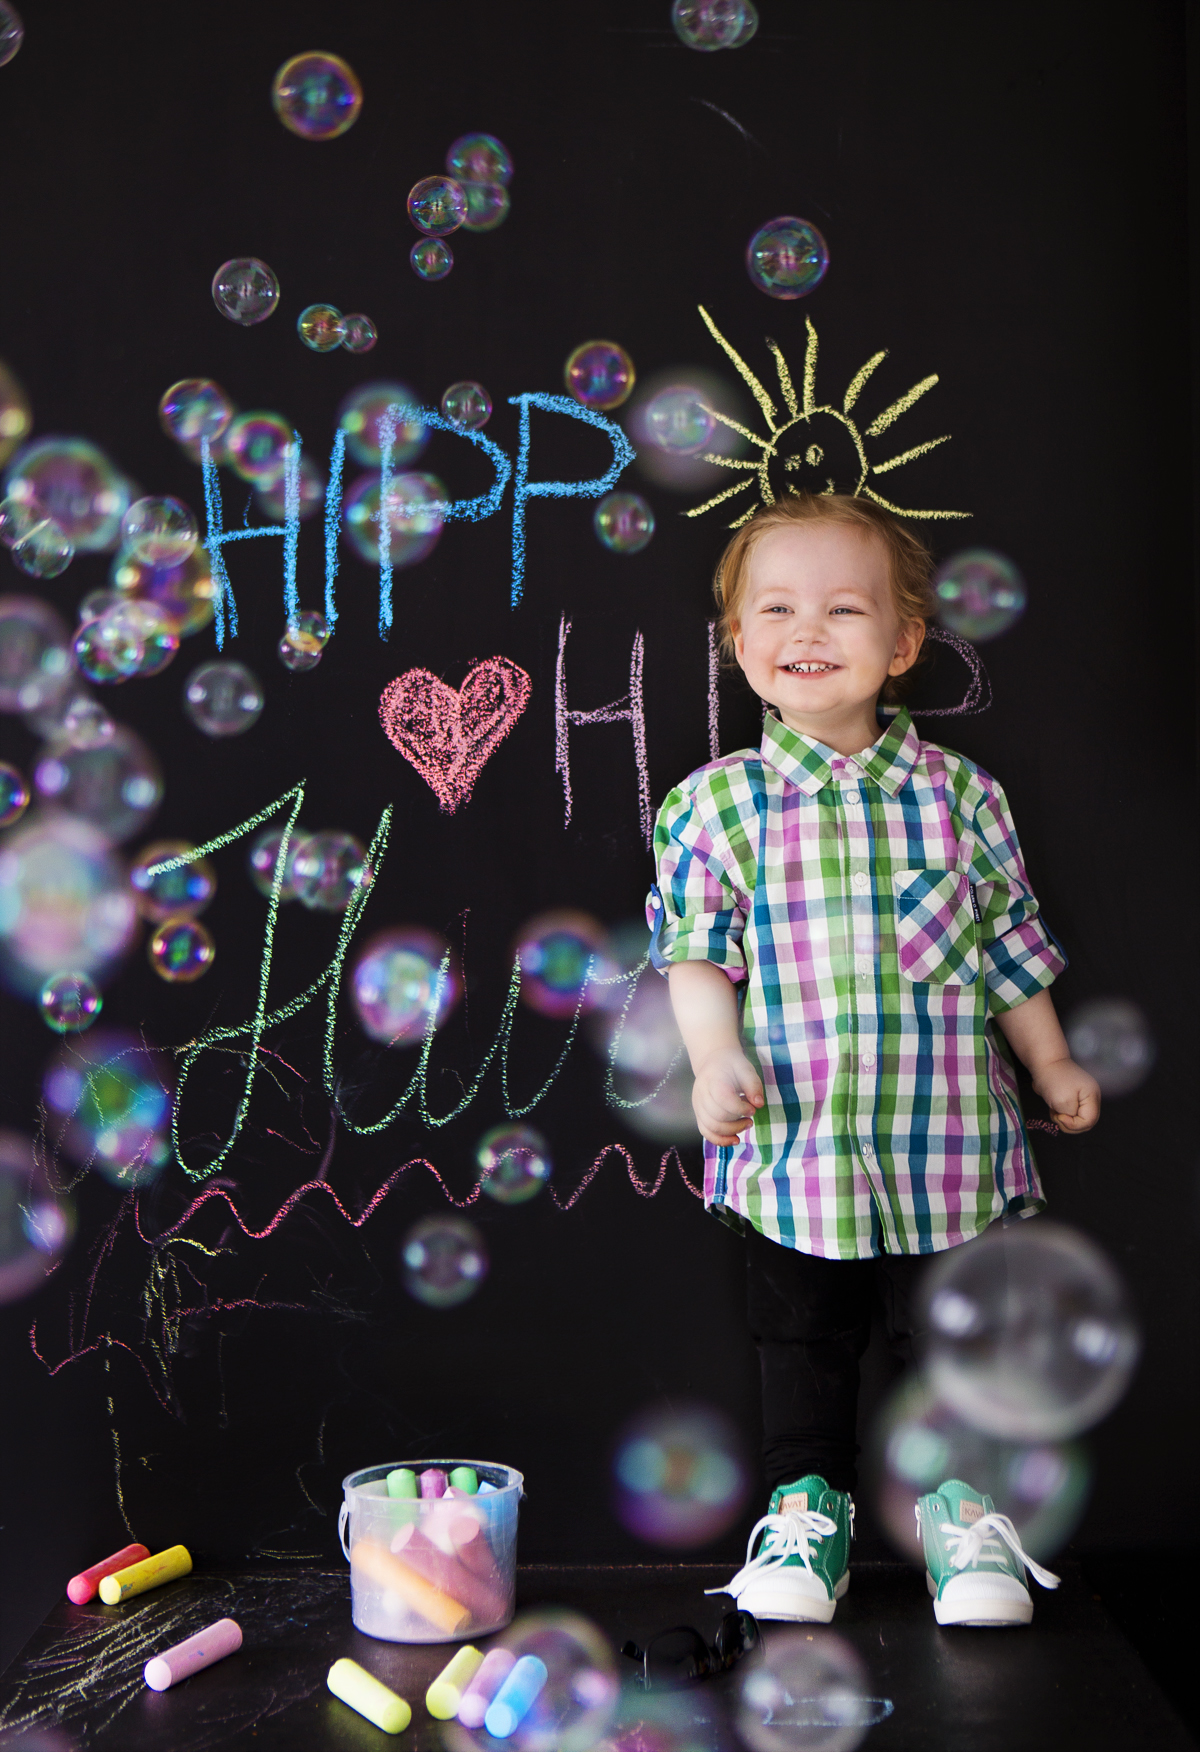 haslien-gravid-storebror-gender-reveal-shoot-baby-storebror-avsløring-foto-fotograf-blogg_18